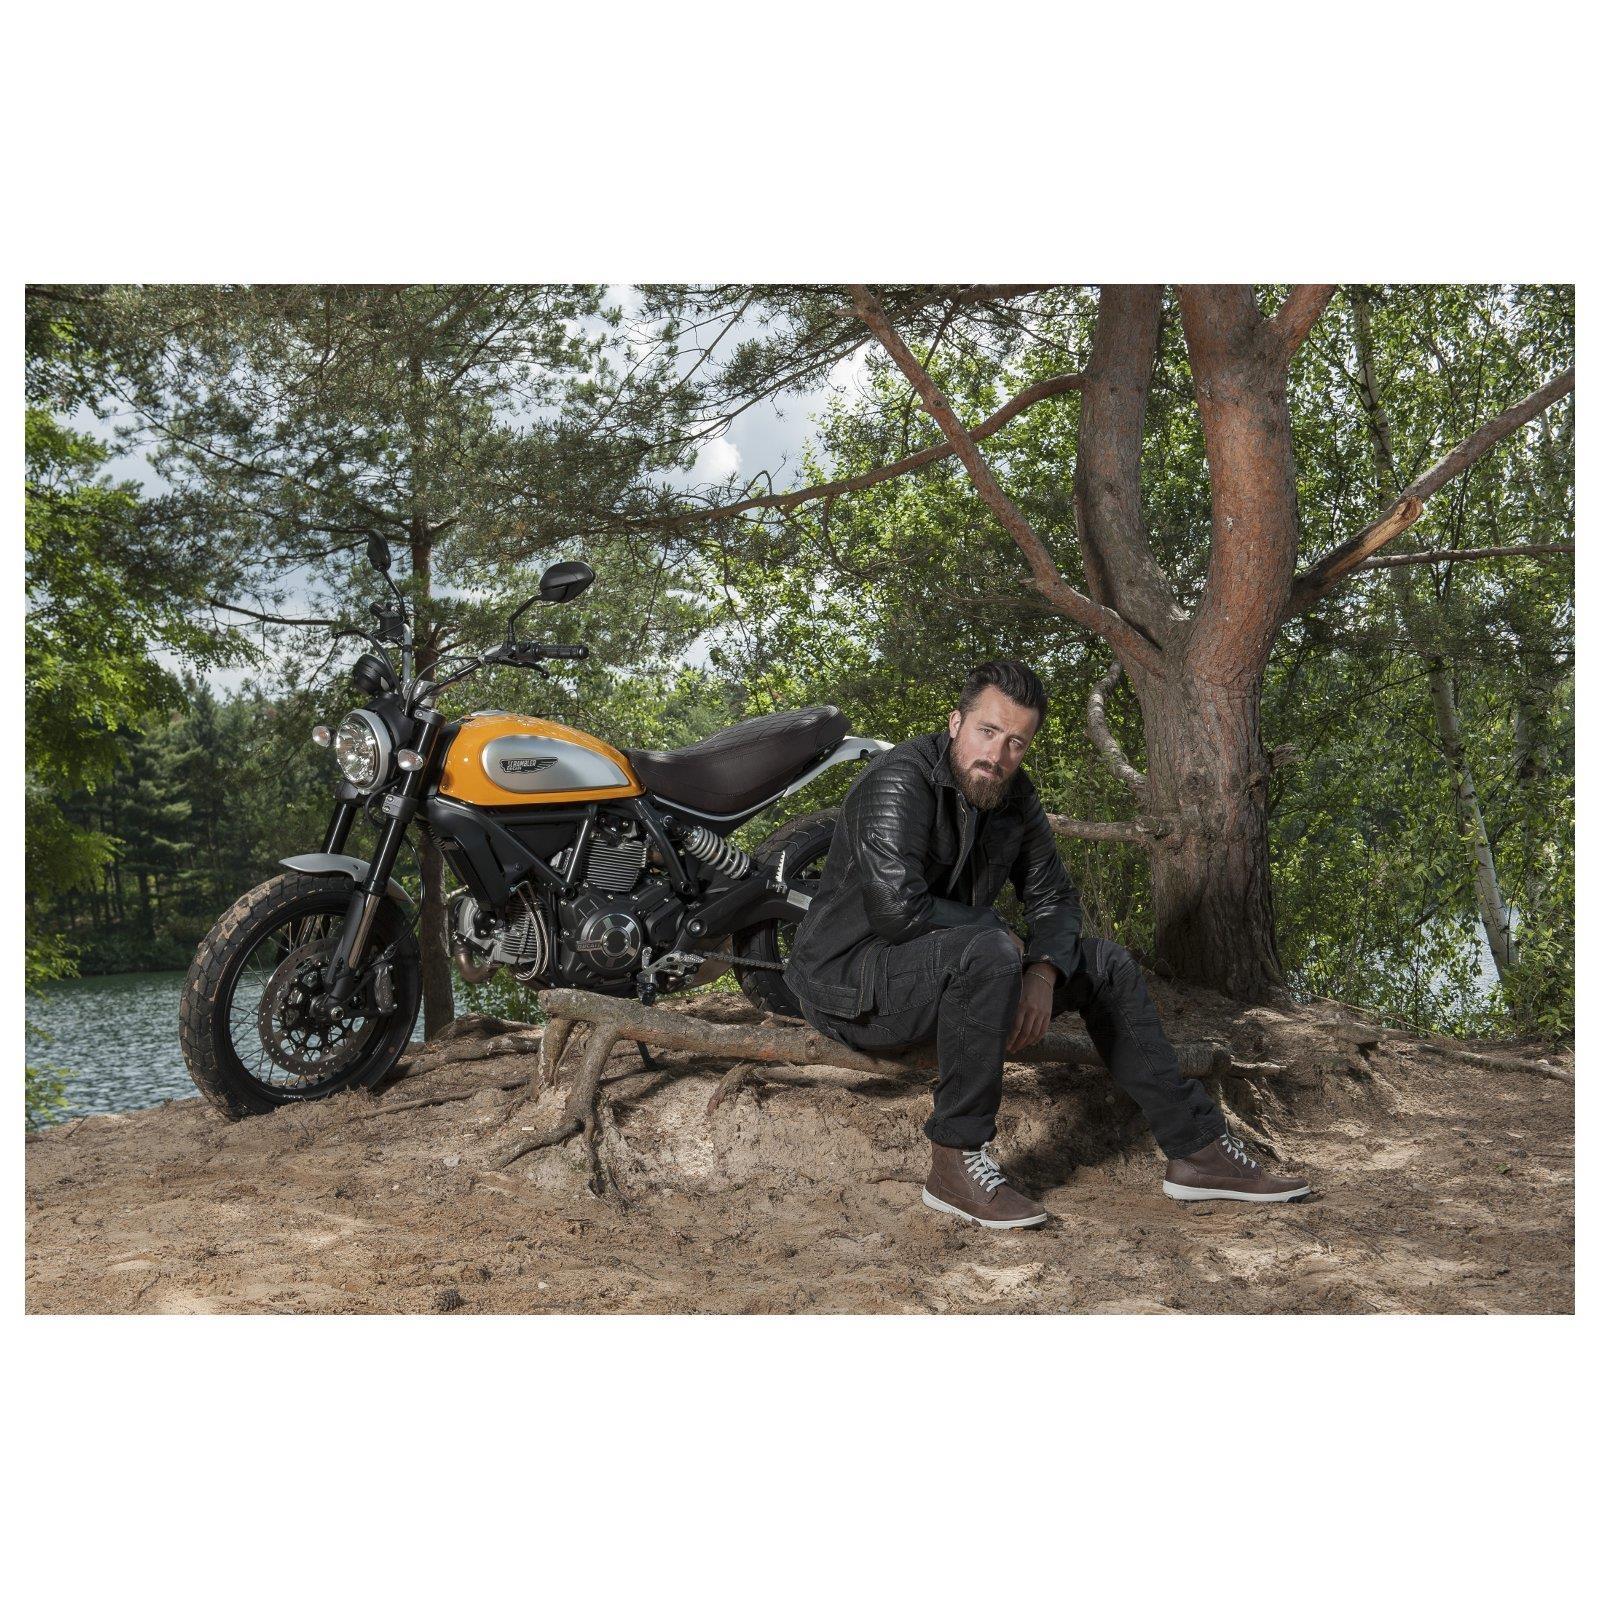 Trilobite-Pantaloni-Moto-Jeans-Abbigliamento-Parado-MICAS-URBAN-DUAL-PANTS-ACID miniatura 34